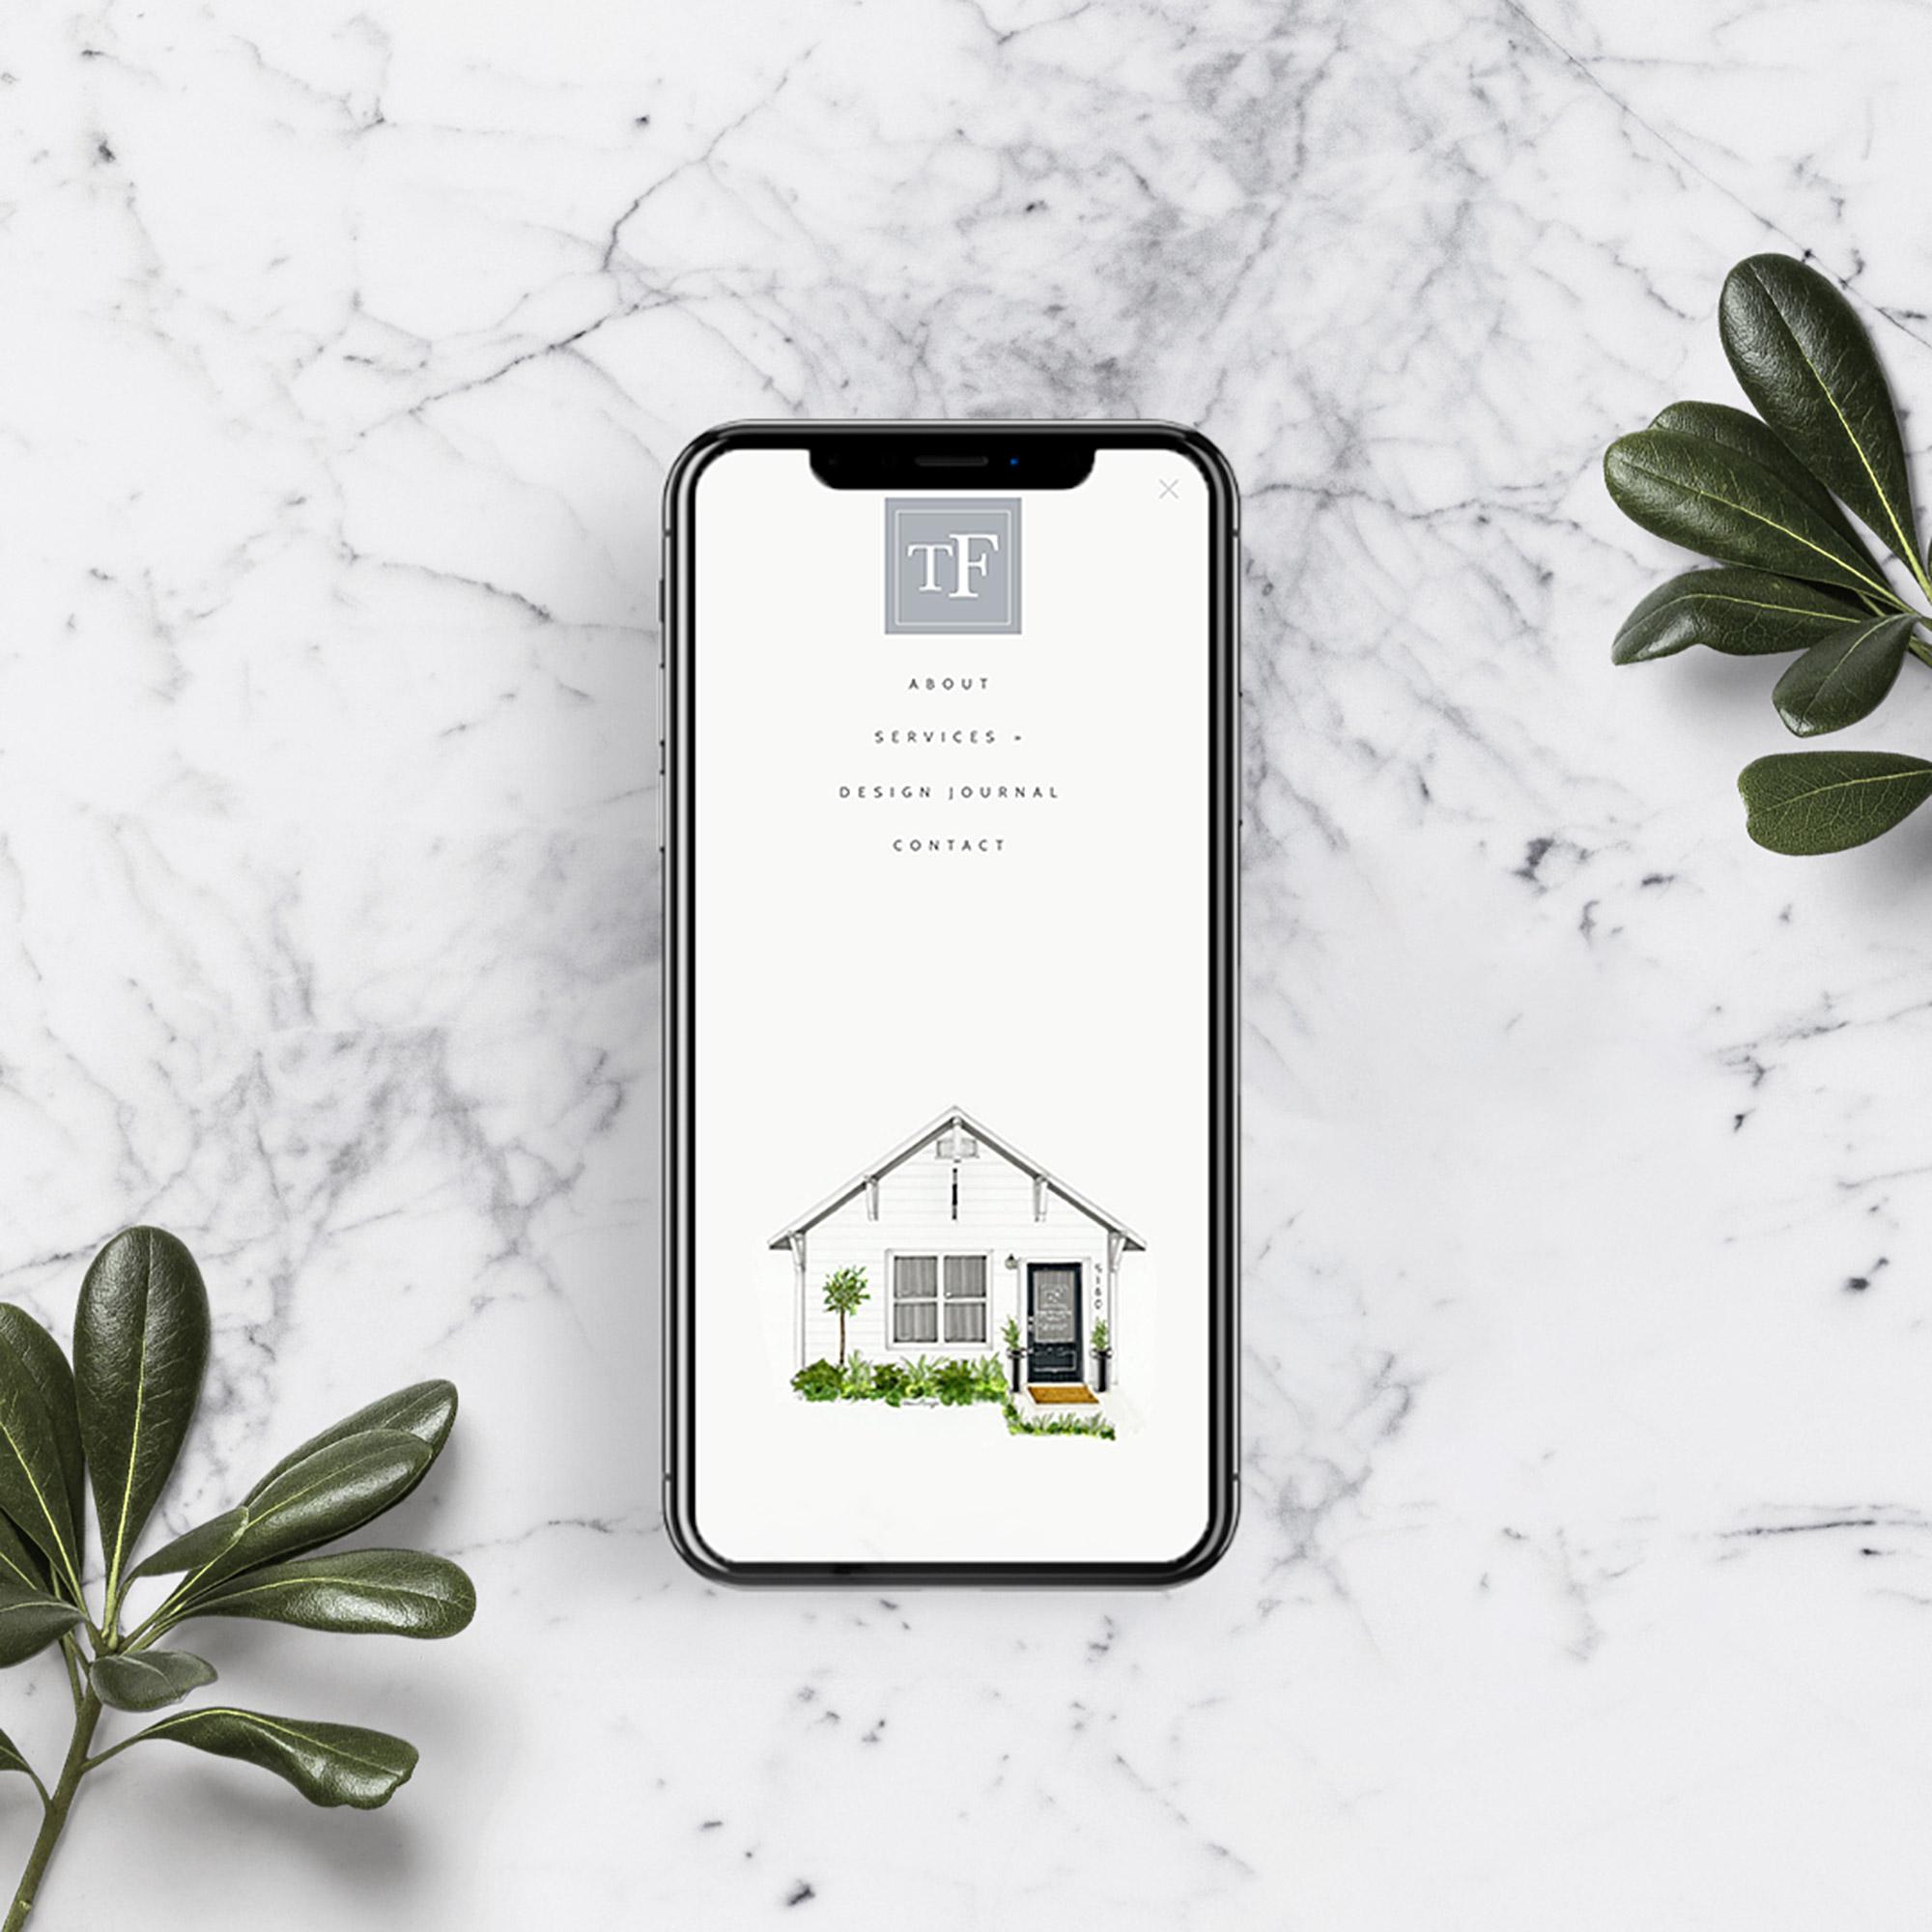 custom mobile menu | by Squarespace web designer Jodi Neufeld Design